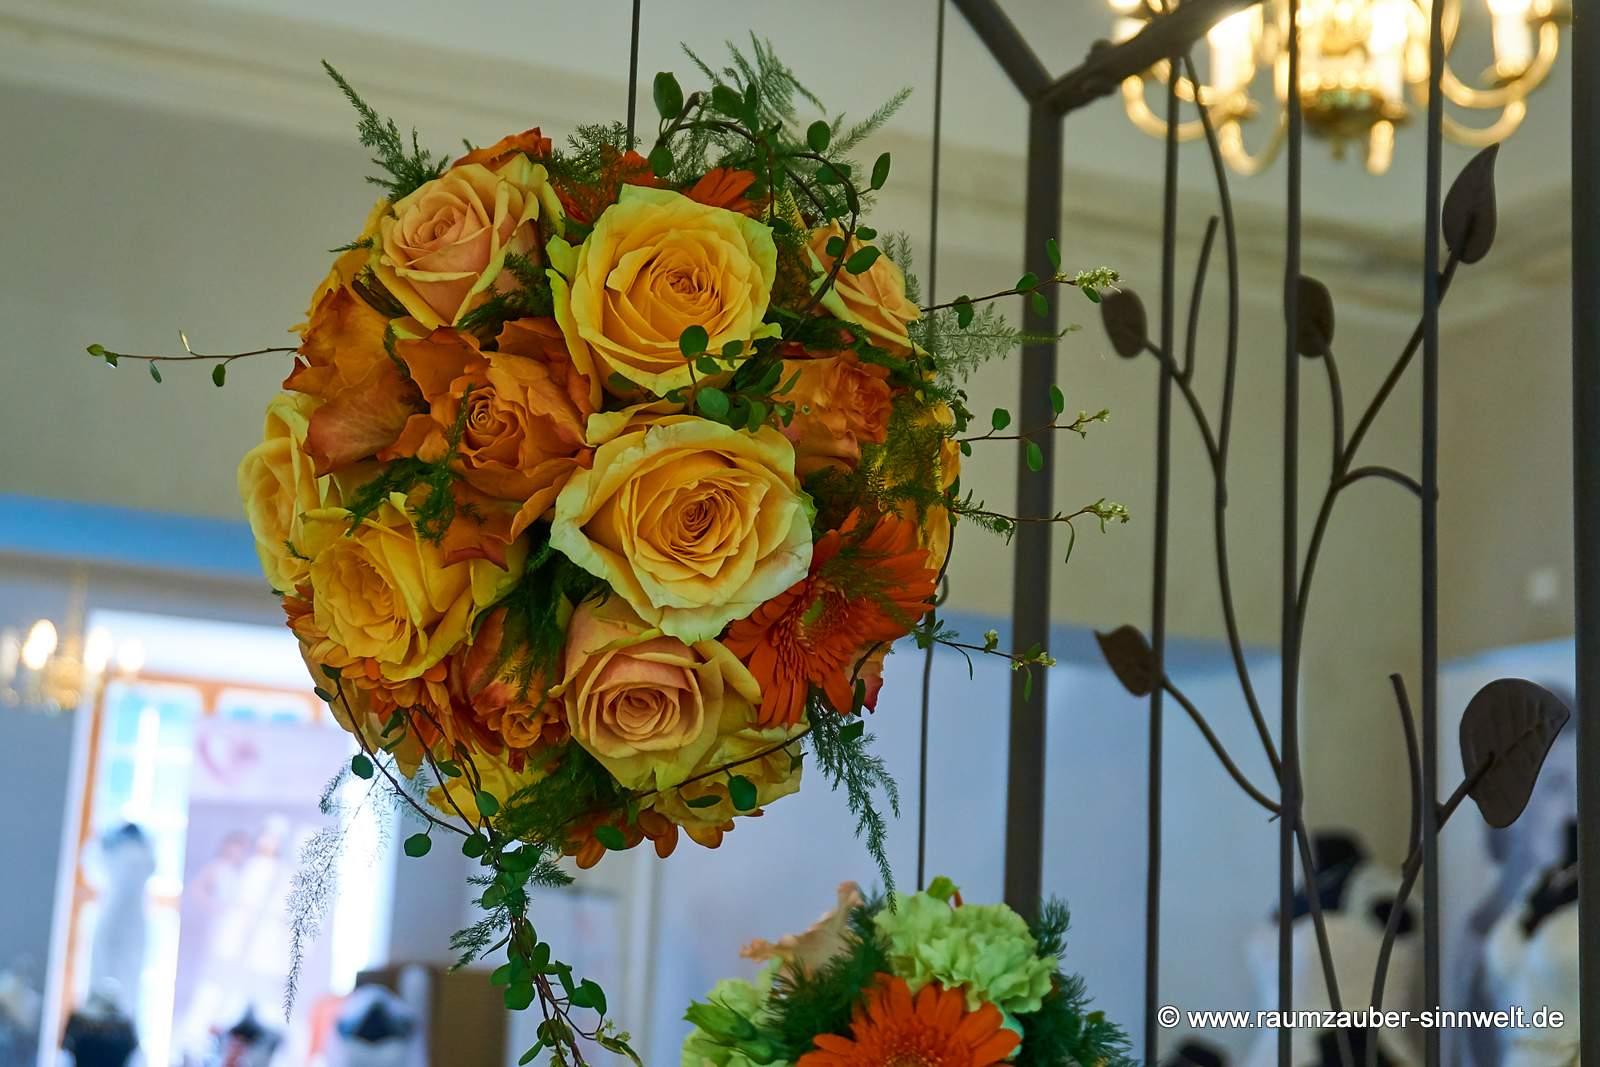 Blütenkugel aus Rosen als Altar- oder Standesamtschmuck